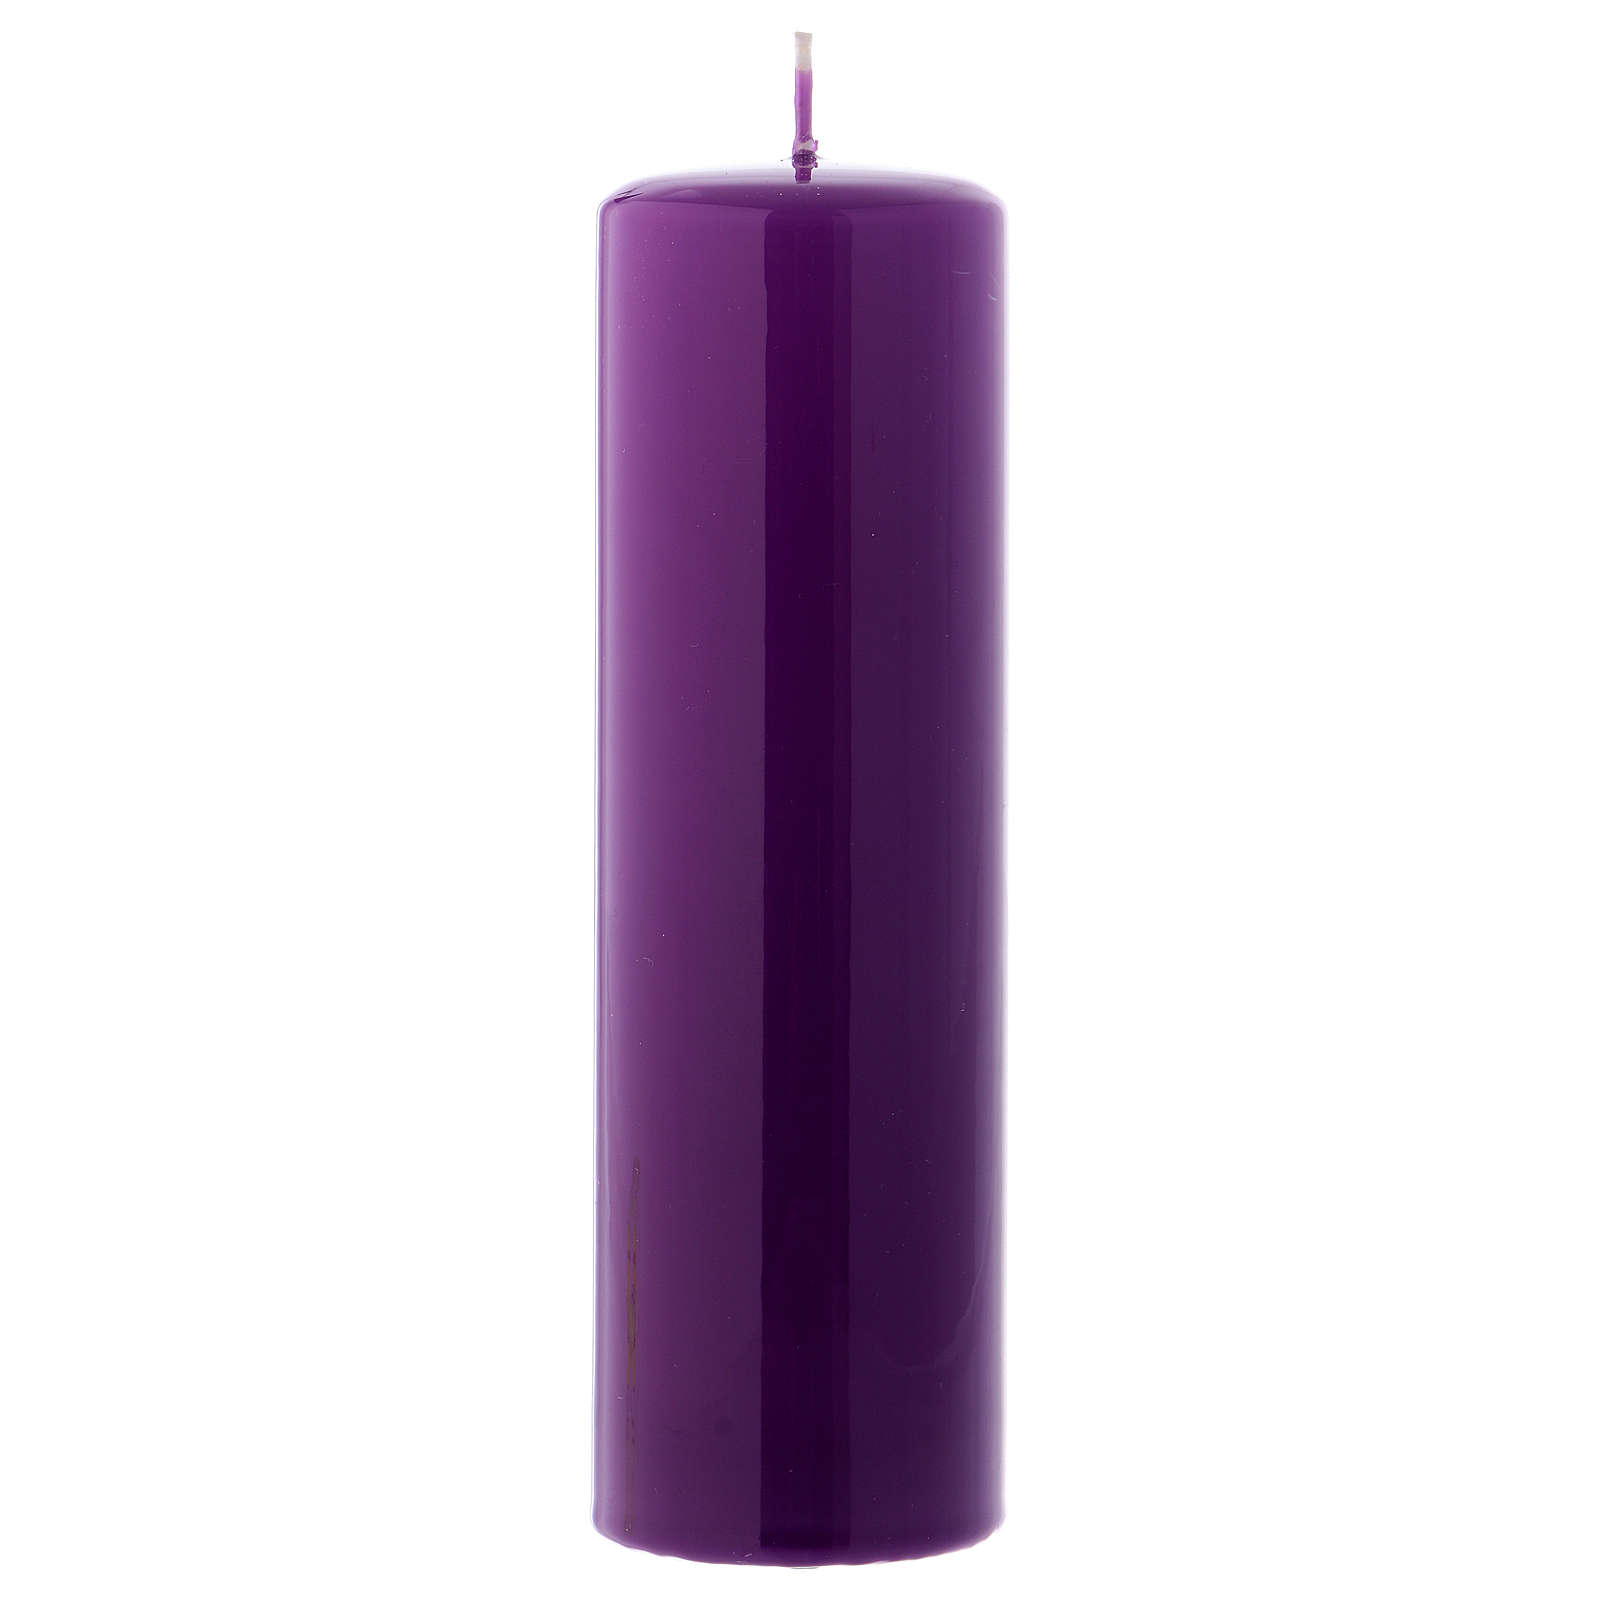 Ceralacca wax candle 20x6 cm, purple 3